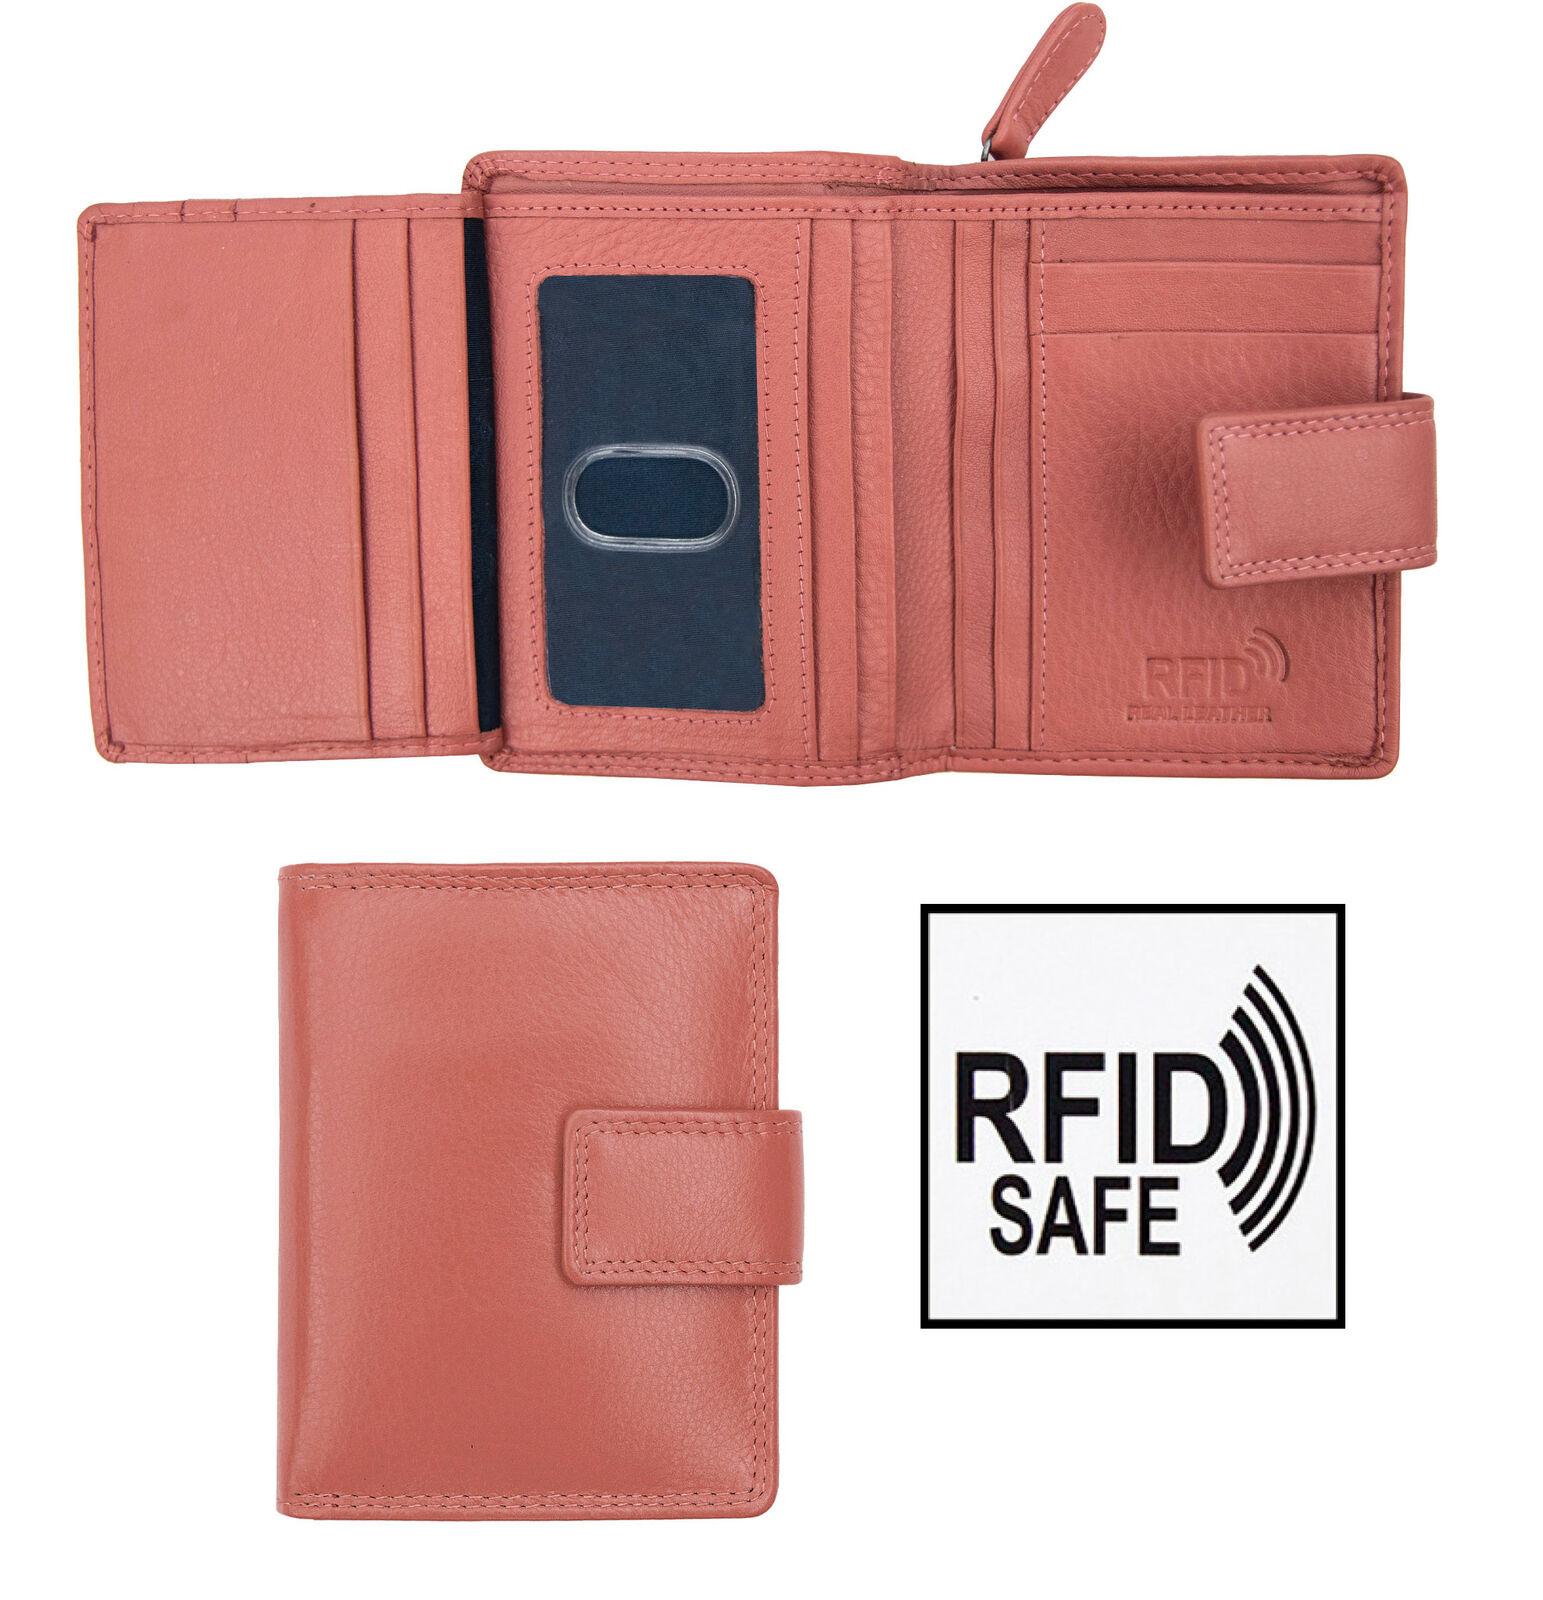 NEW Prime Hide Women's Tri-Fold Dusty Rose Leather Purse Wallet RFID Blocking